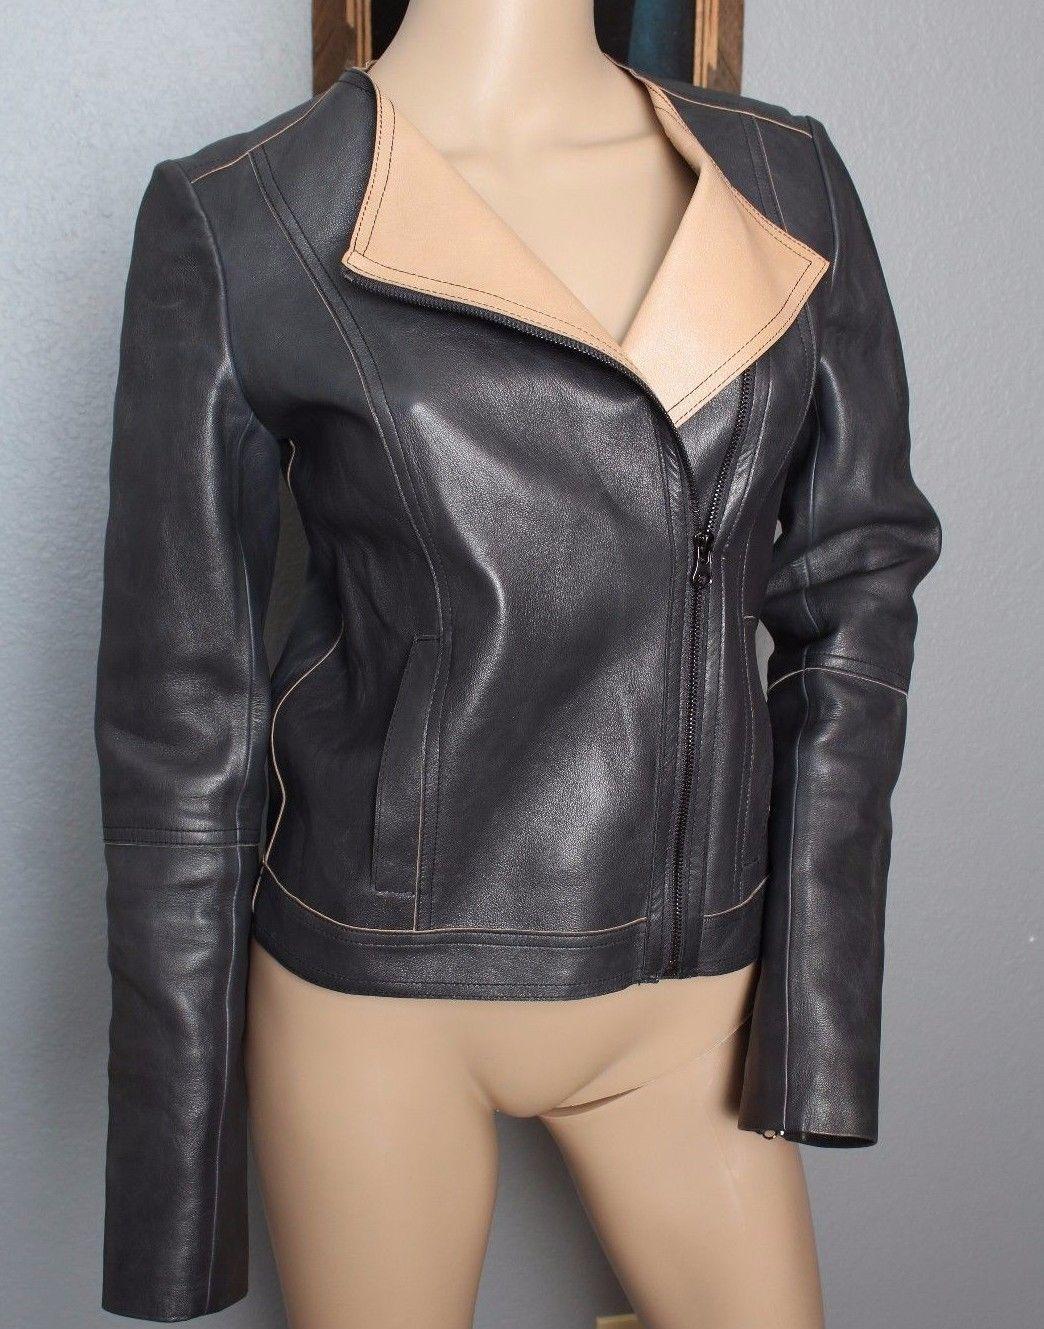 Vince BUTTER SOFT Gunpowder Dark Gray Black Tan 100% Leather Motorcycle Jacket S - $379.99